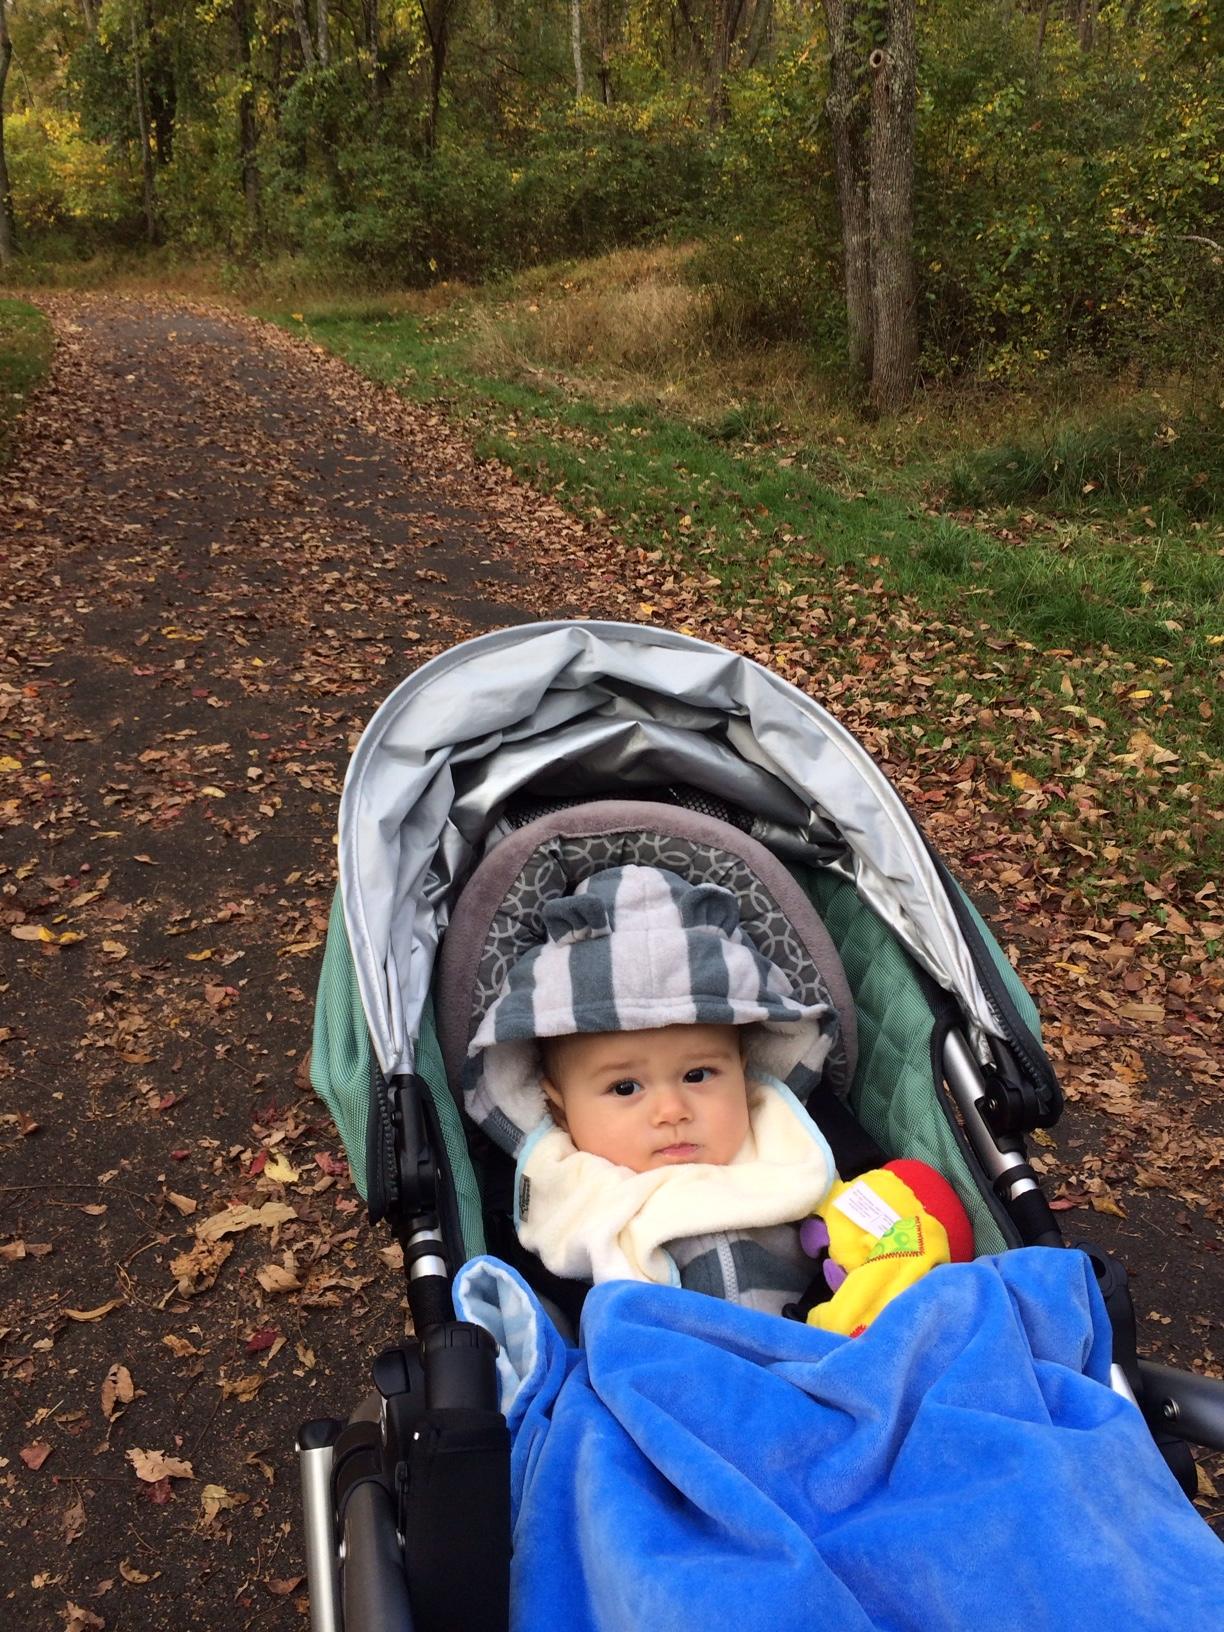 Baby boy o in stroller